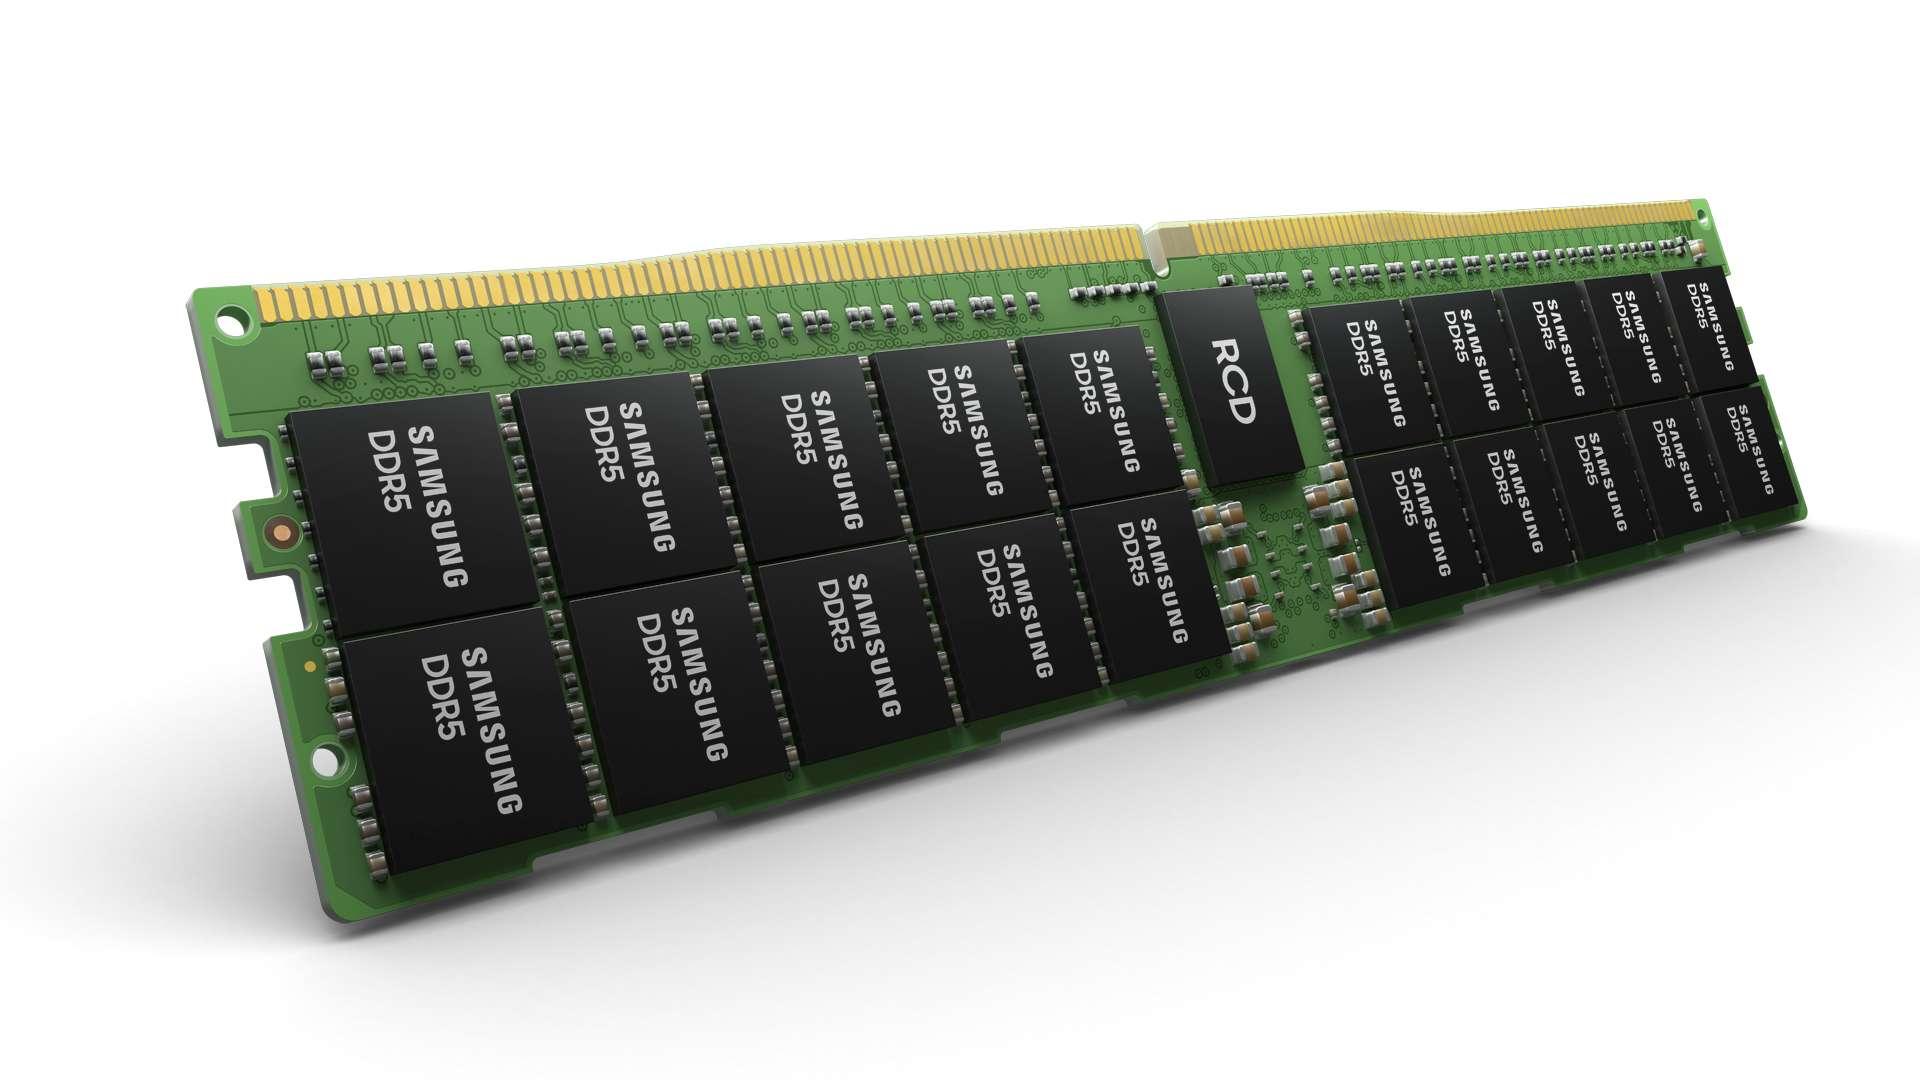 DDR5 RAM module from Samsung has mammoth 512GB capacity